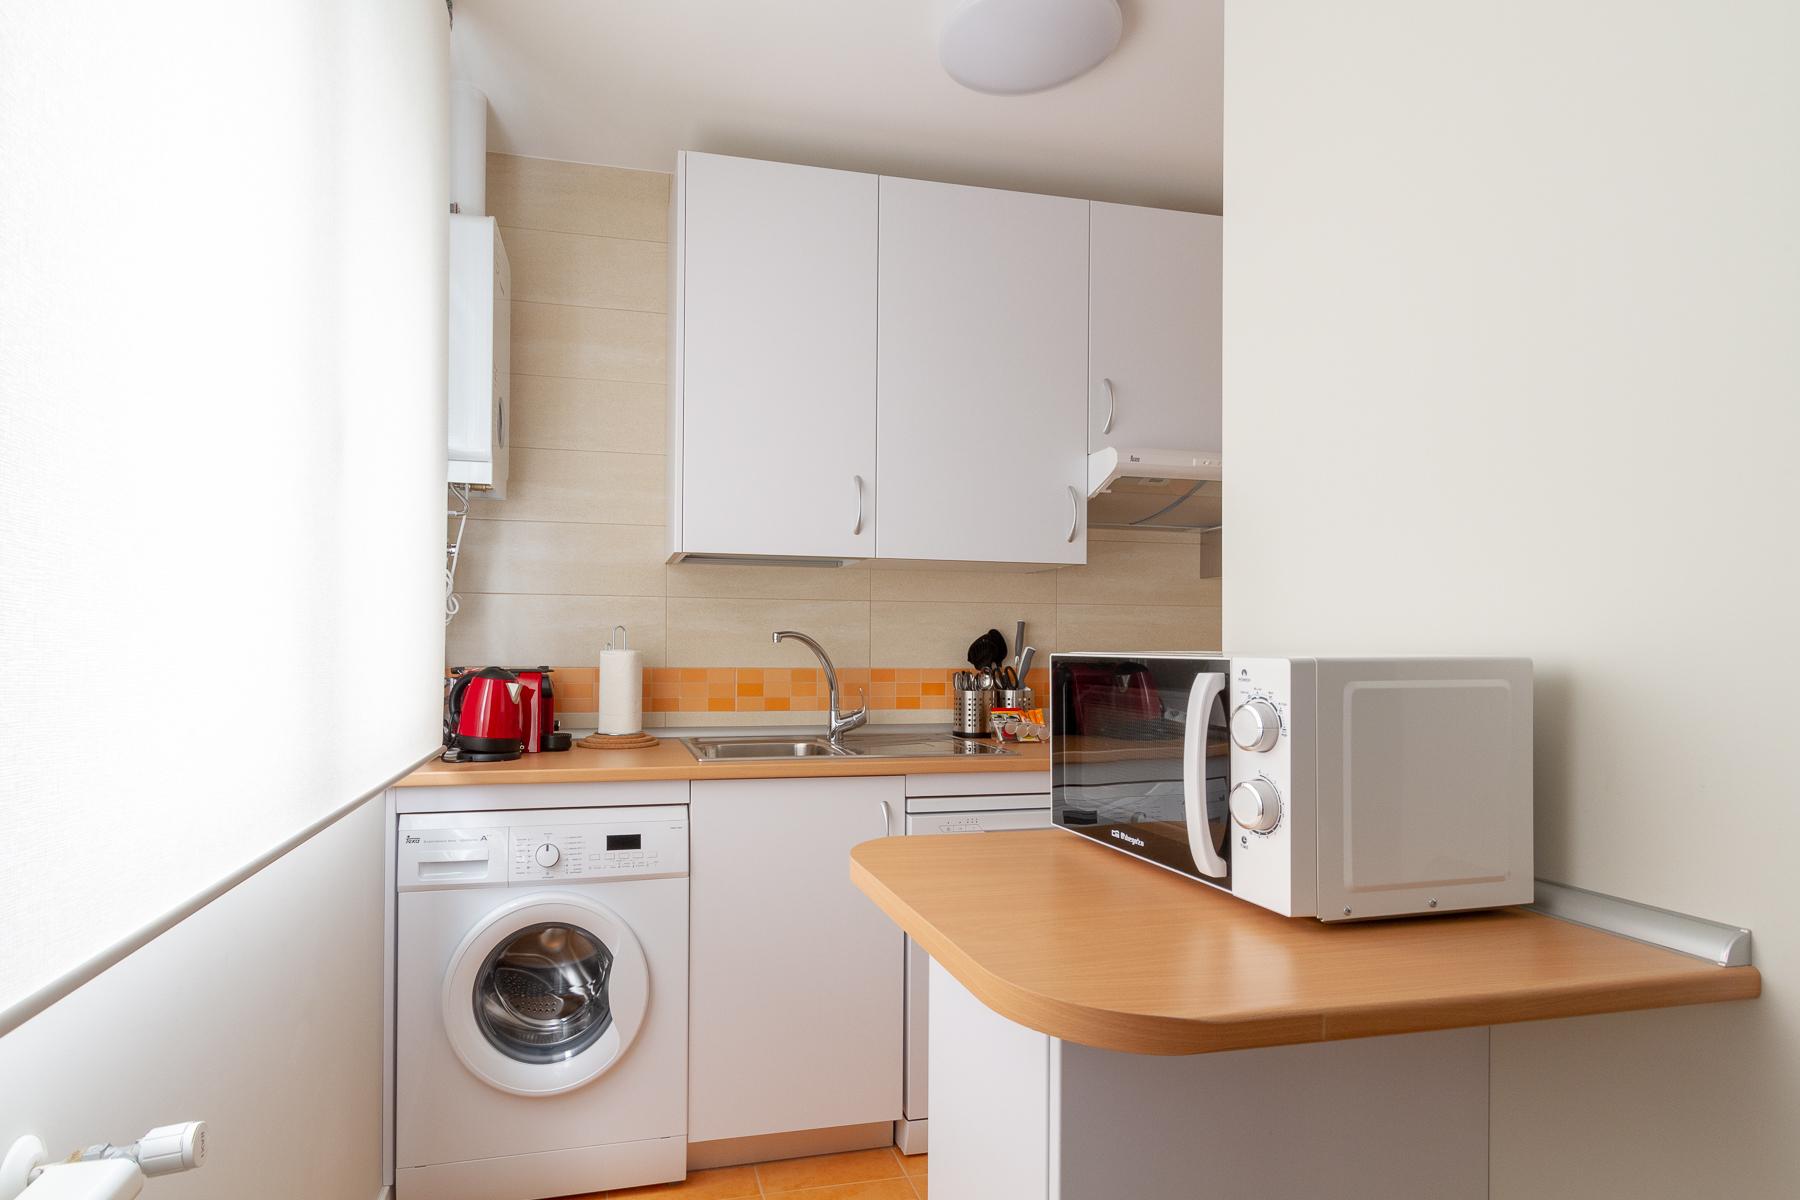 Kitchen area at the Calle Ibiza Apartments